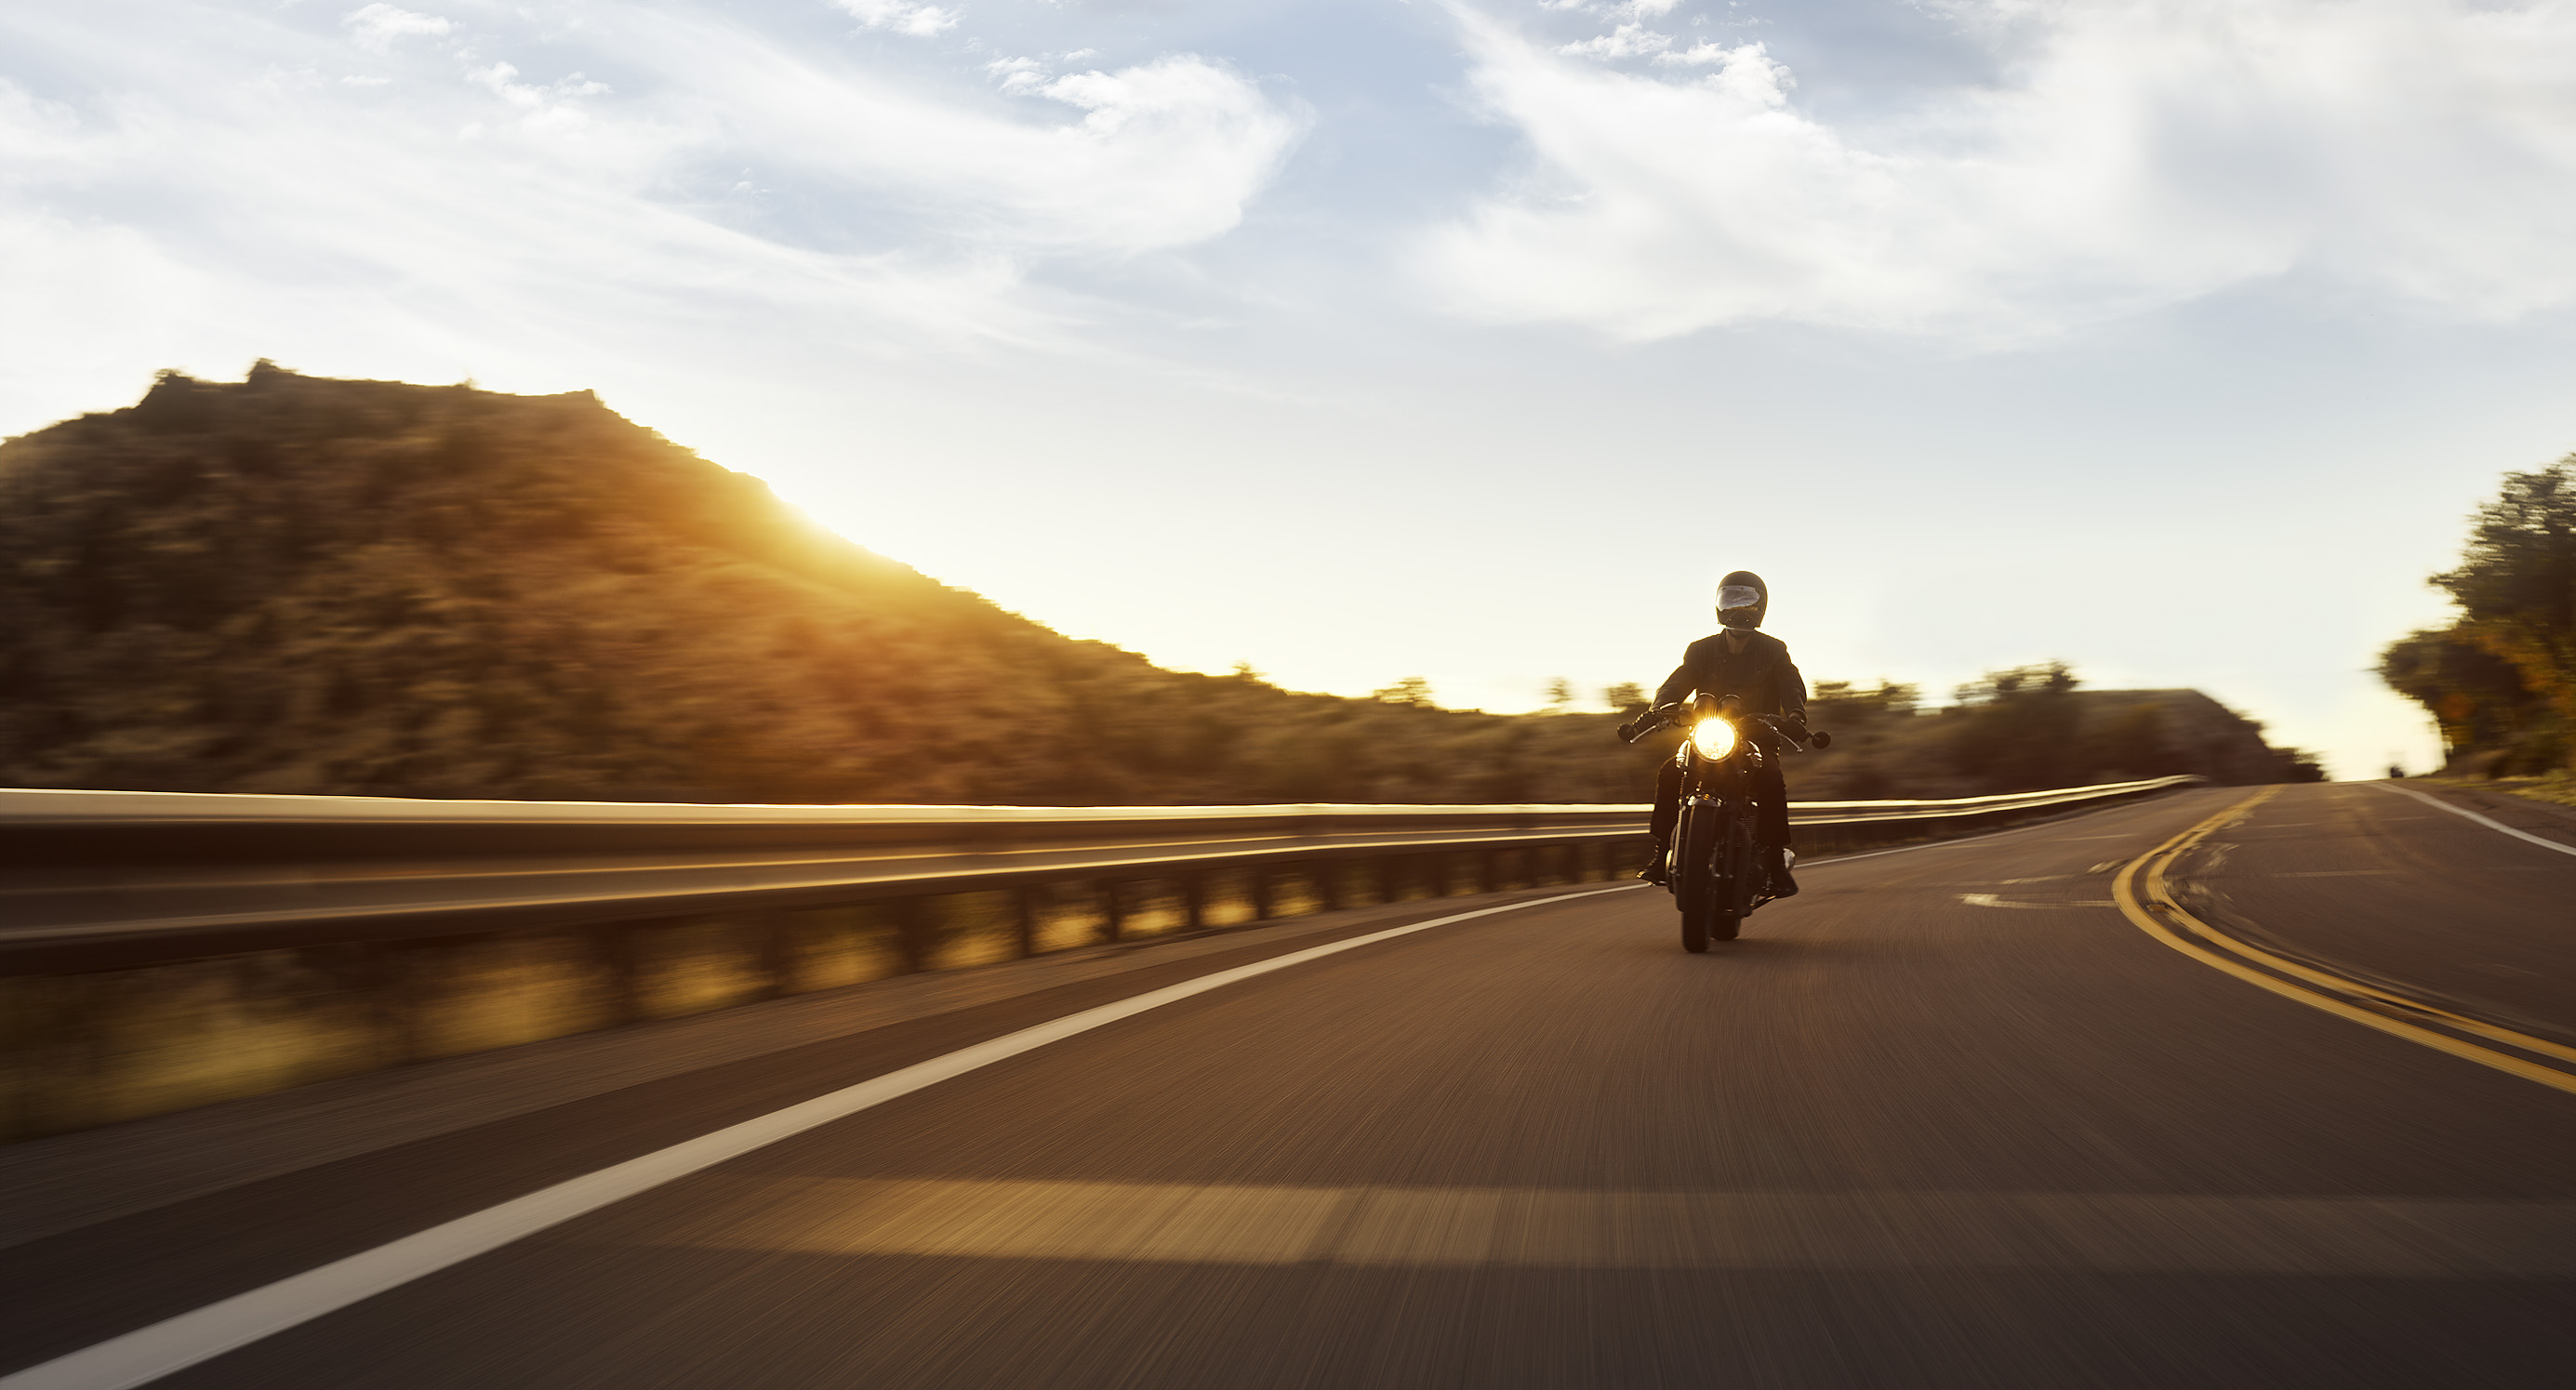 phoenix commercial photographer, tucson commercial photographer, motorsports photographer, arizona commercial photographer, commercial photography phoenix az, triumph motorcycles photography, triumph motorcycles